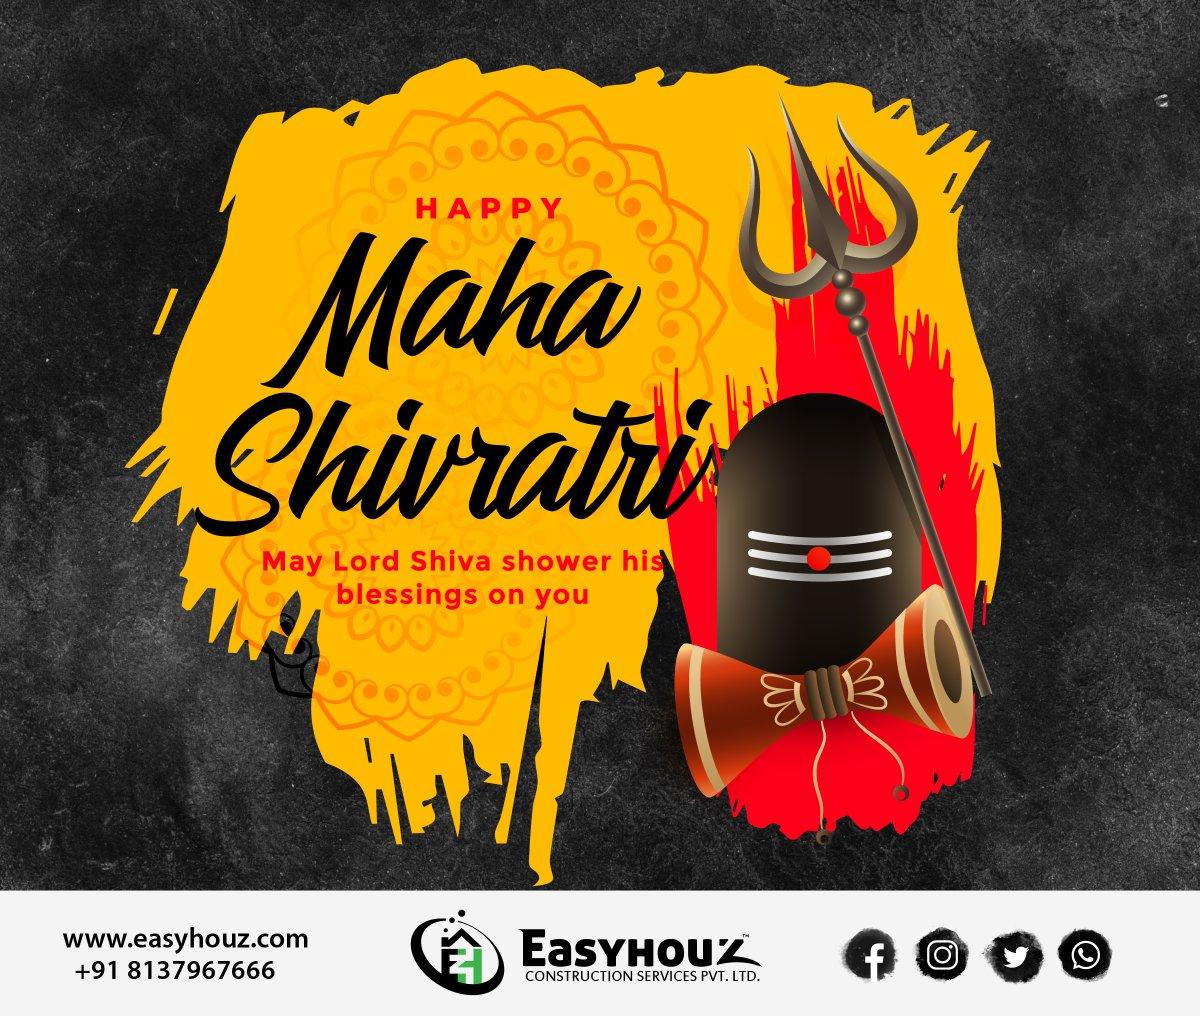 Easyhouz wishes you and your family Happy Maha Shivaratri..  @easyhouz . . . . . . . . #easyhouz #budgethomes #homes #homedecore #luxuryhomes #maha #shiva #rathri #shivarathri #manoramahouse #contemporarydesign #dreamhome #archidaily #traditional #keraladiaries  #versatilemediapic.twitter.com/u0RYWsjKLO